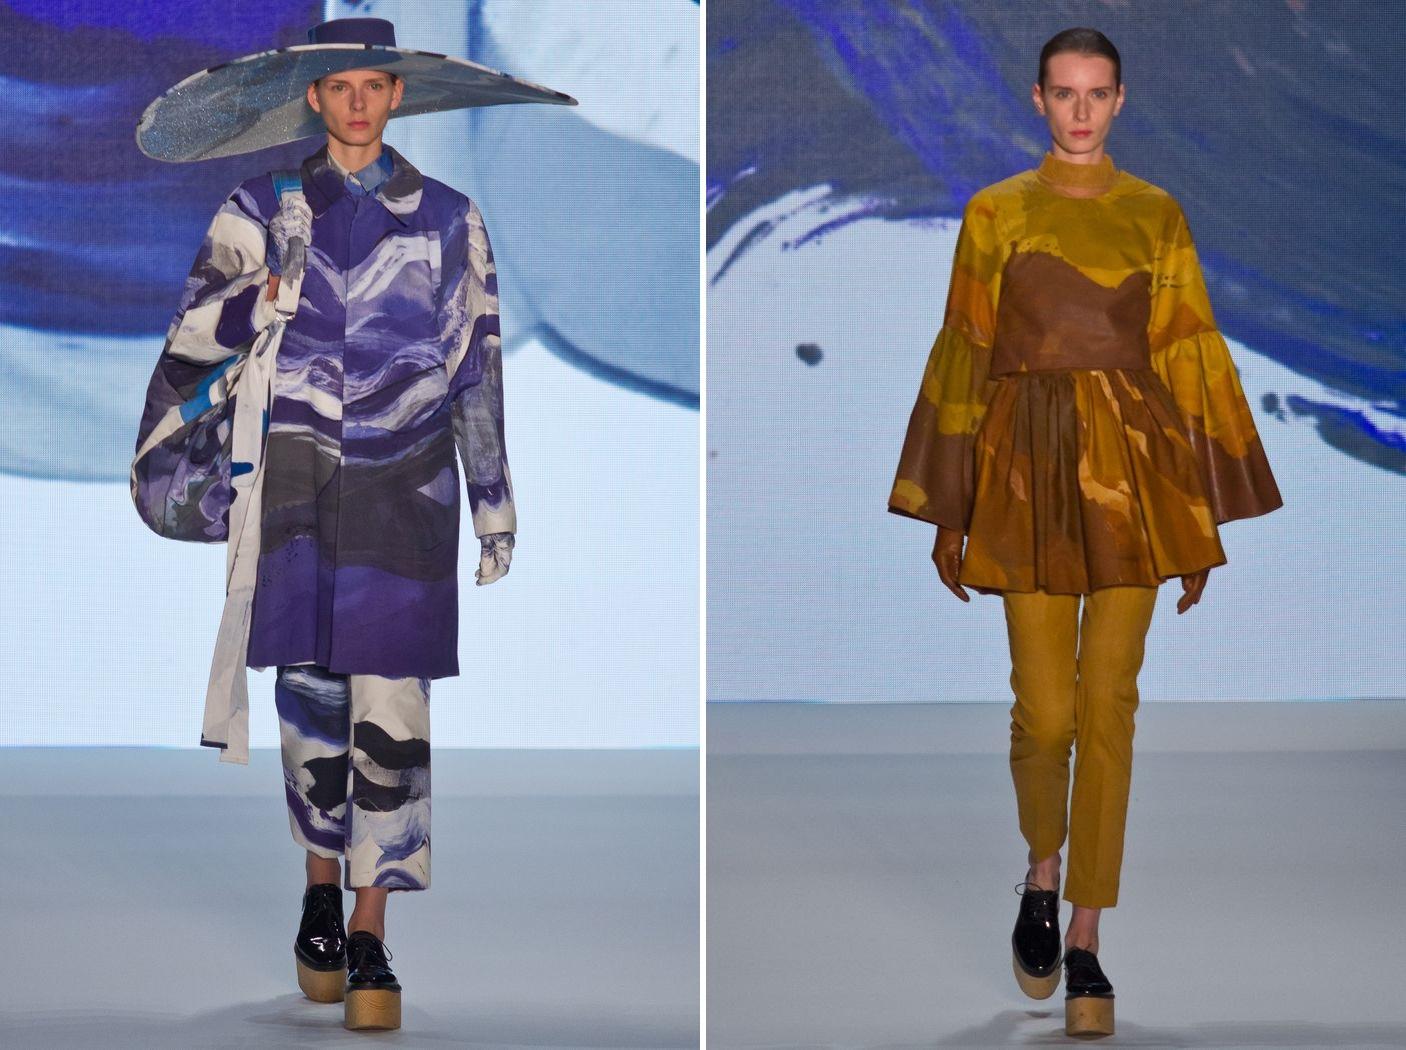 satu maaranen fashionvictress 02